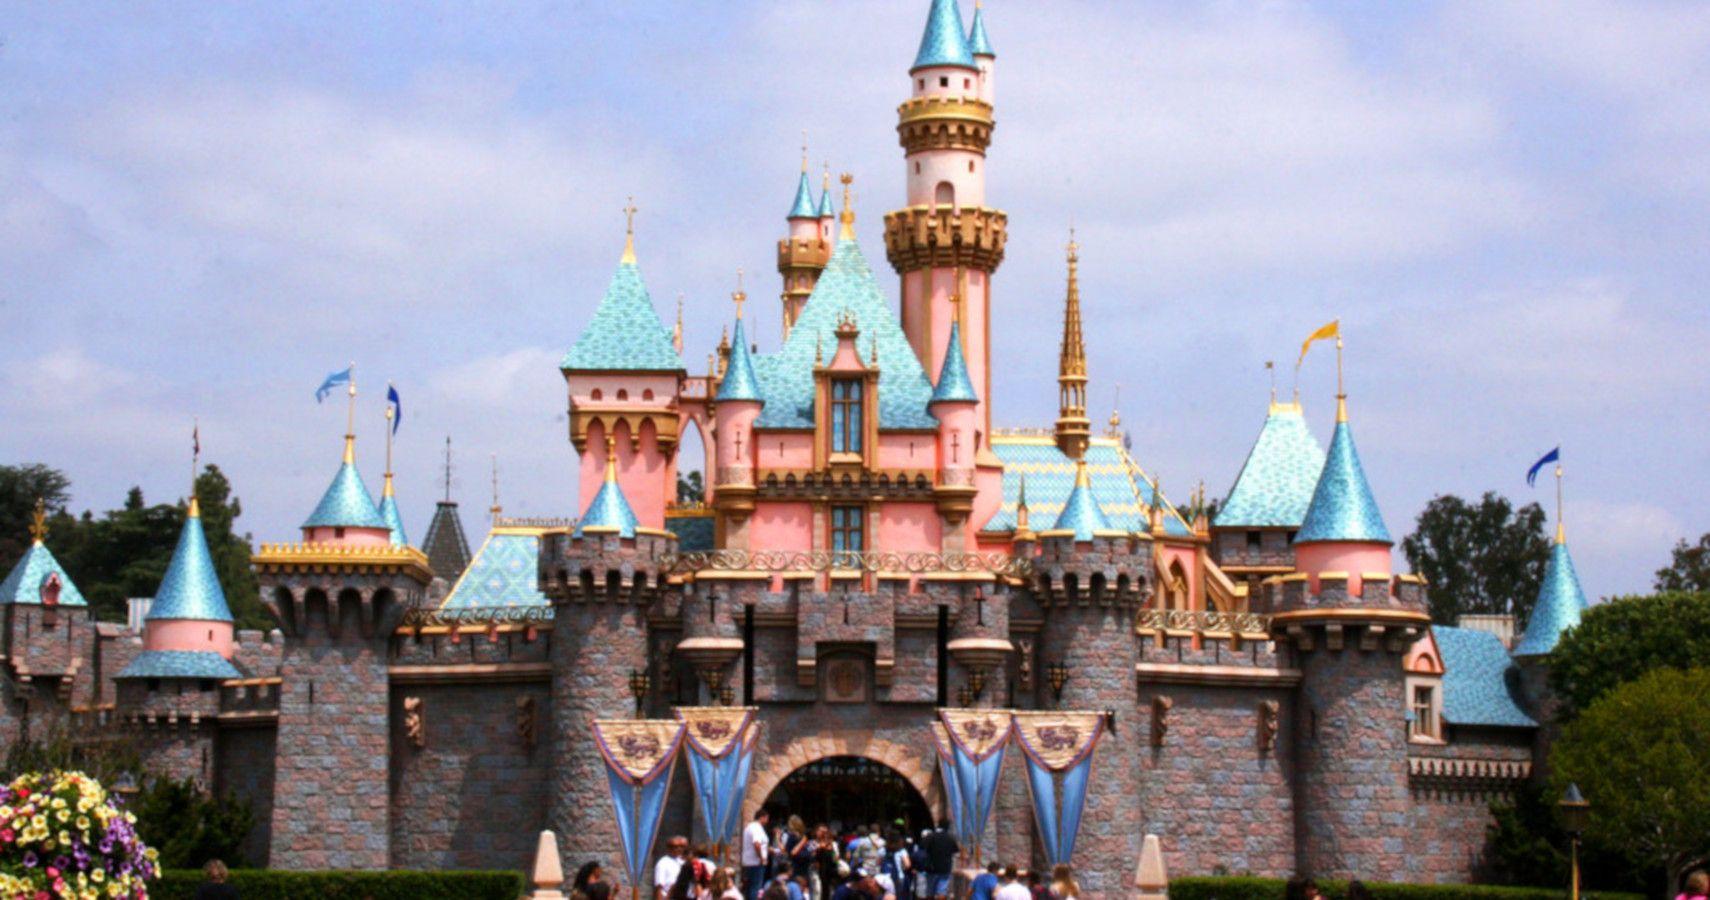 Disneyland Will Finally Reopen Next Month | Moms.com